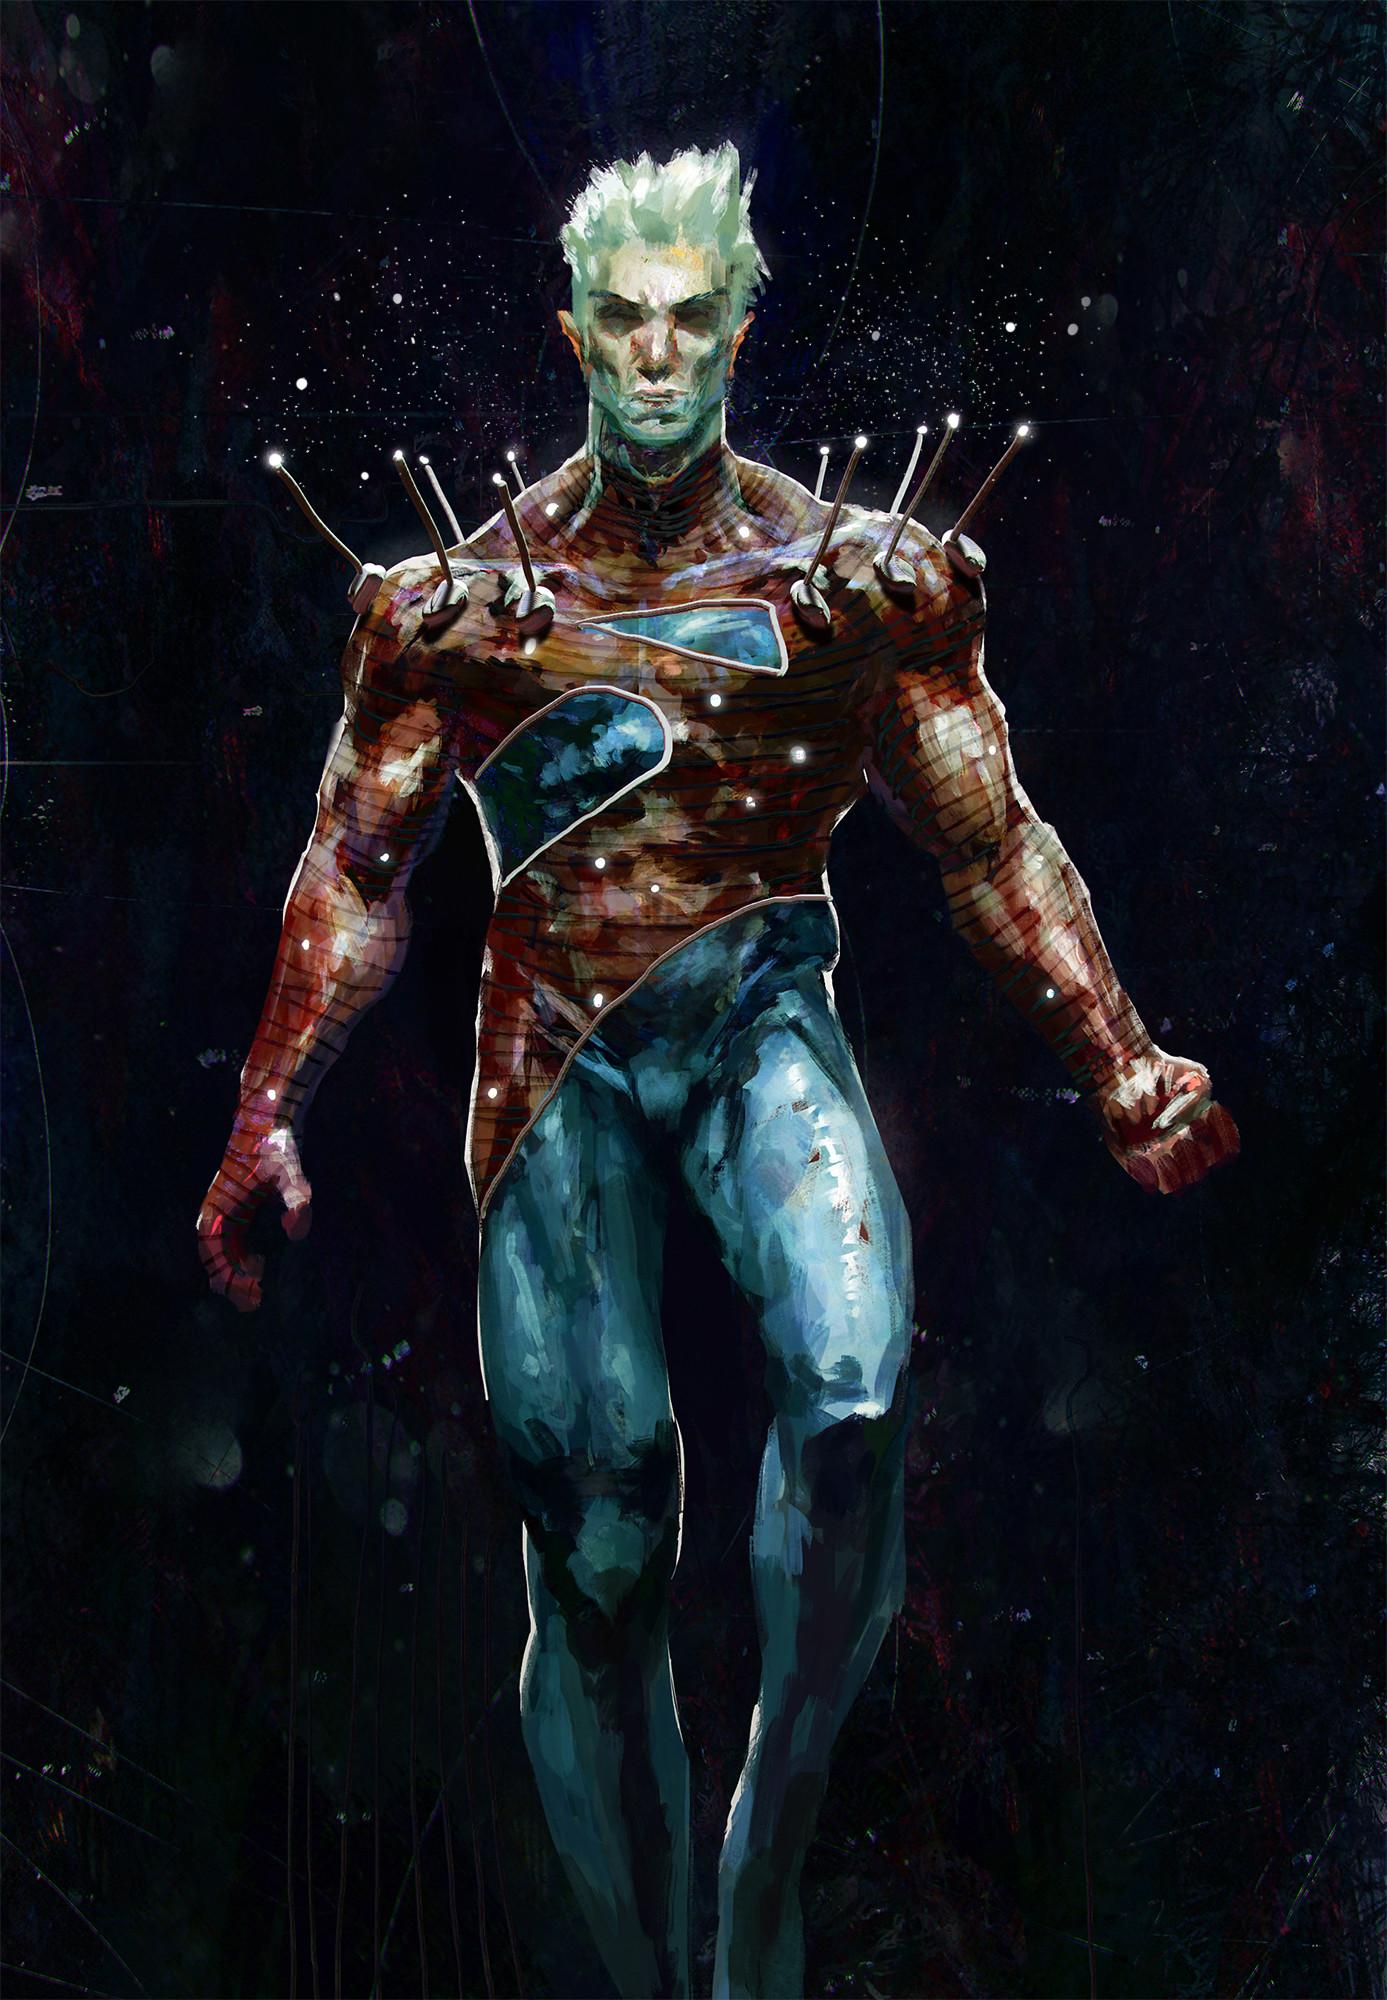 Chenthooran nambiarooran superman11 3